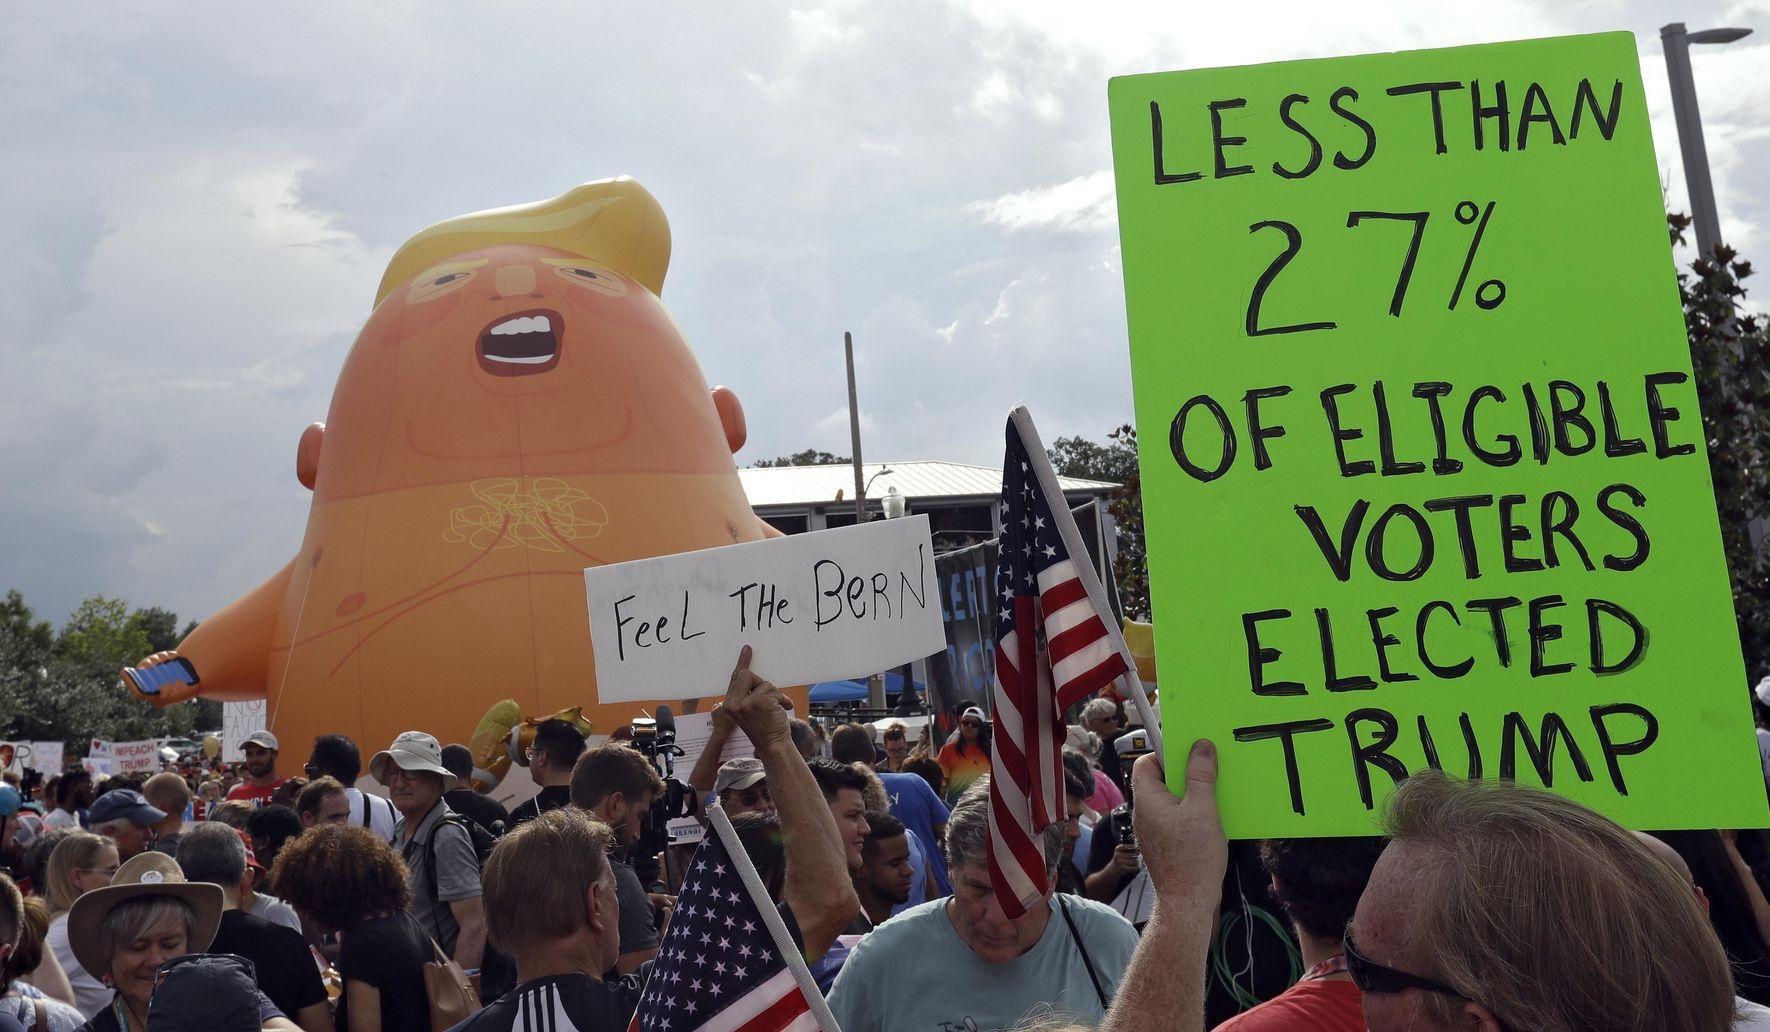 Baby Trump blimp to visit Copenhagen despite president's cancellation